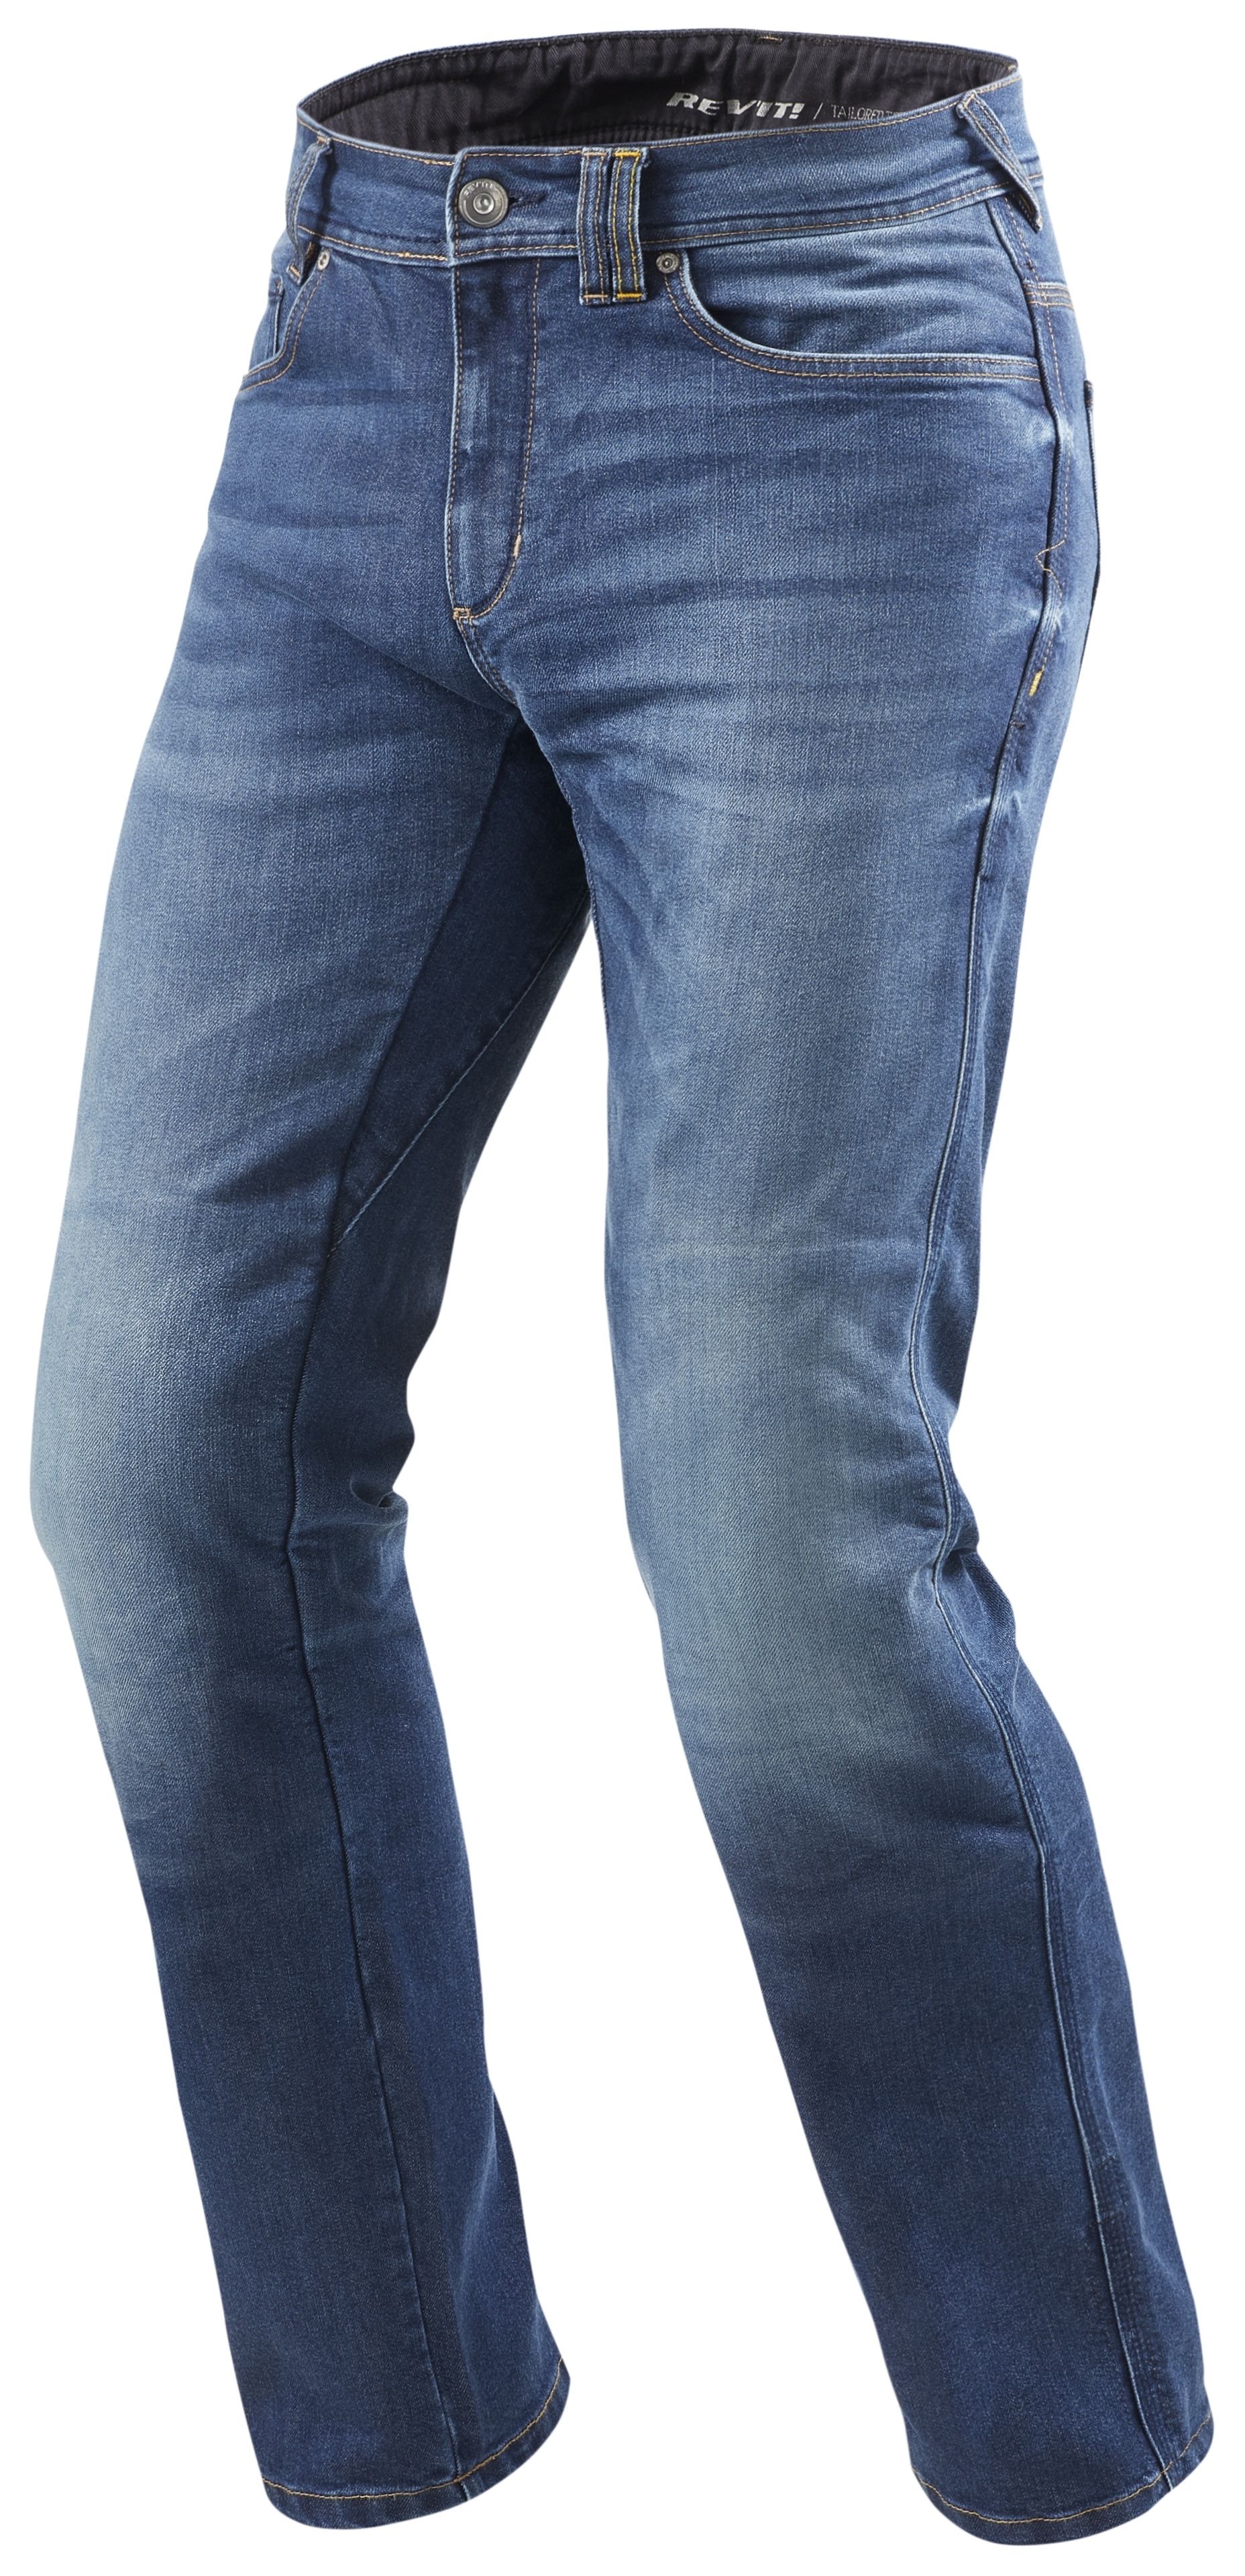 35bf7869 REV'IT! Philly 2 Jeans - RevZilla